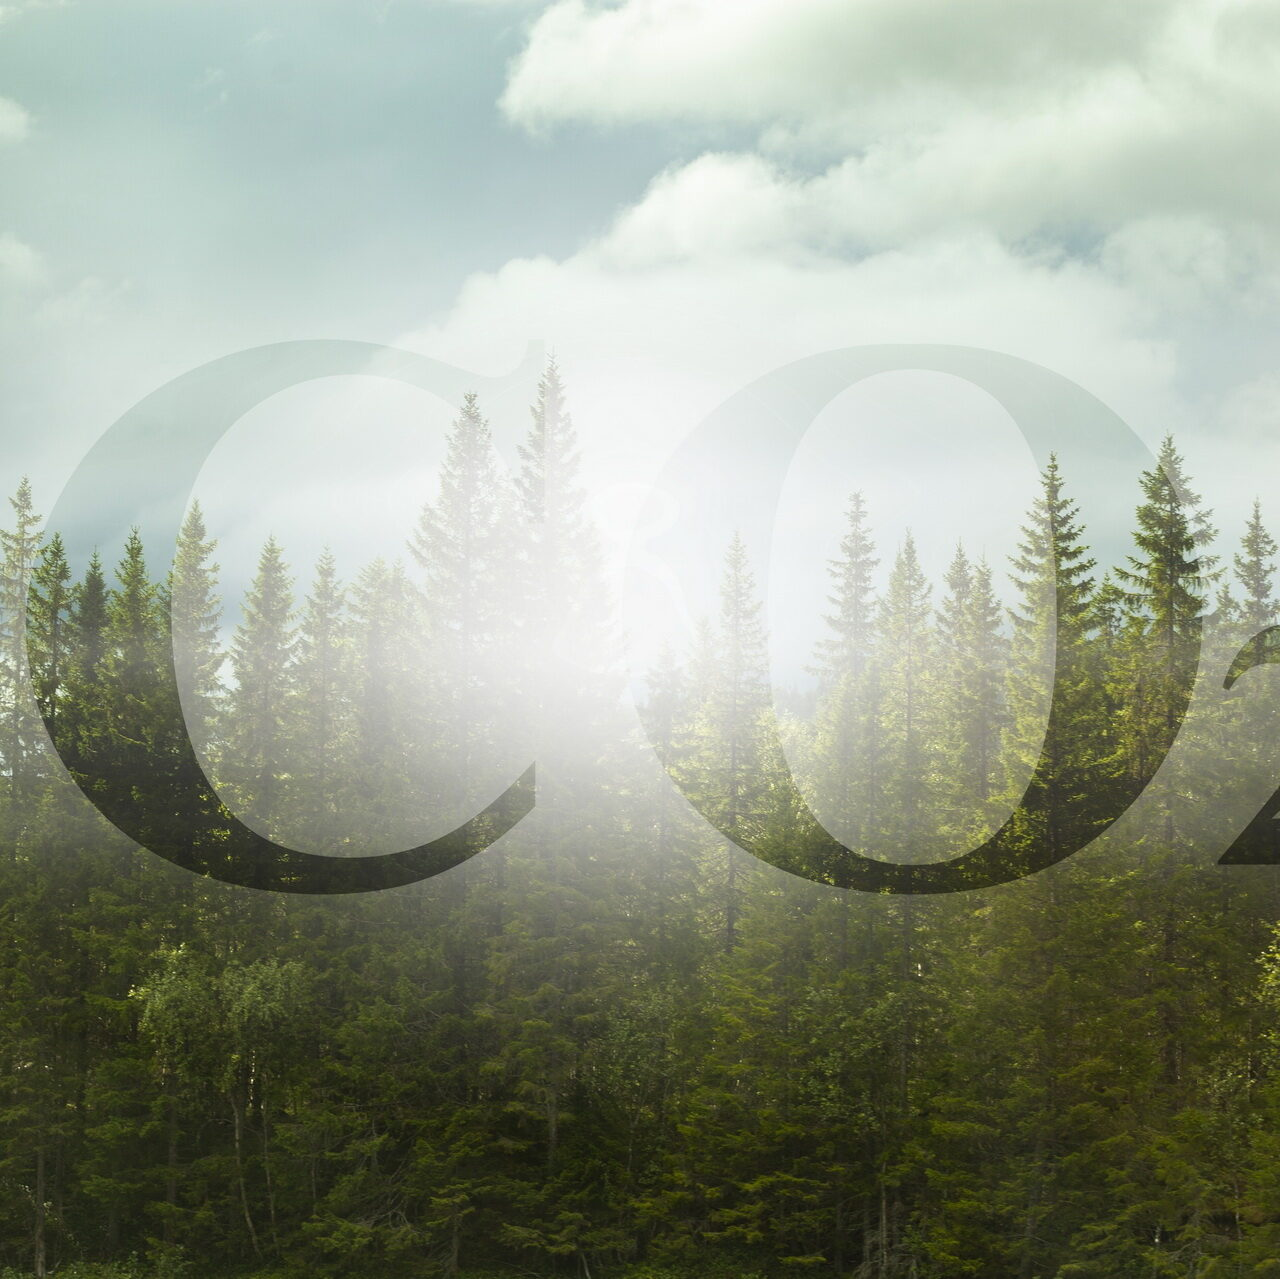 CO2-Bepreisung als Erfolgsmodell?